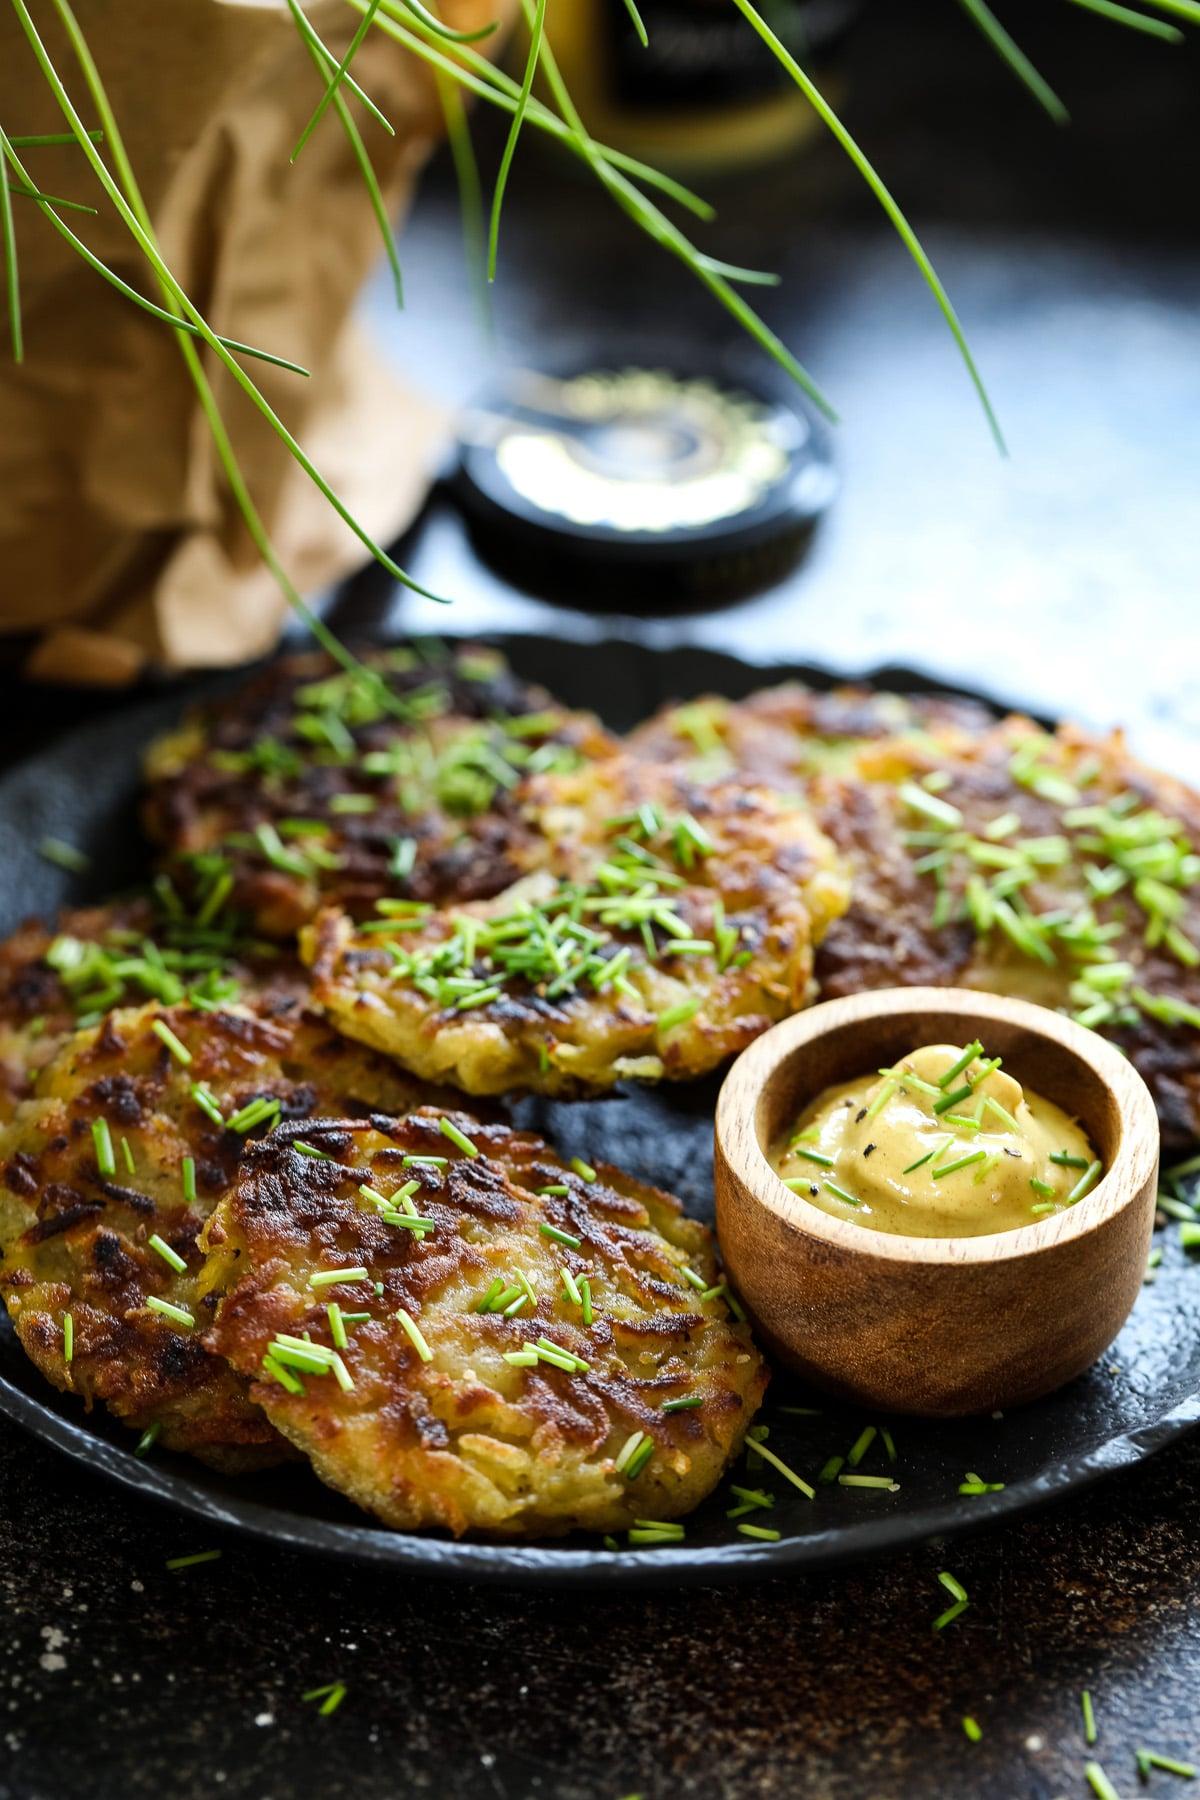 Vegan Potato Pancakes Served with Mustard.